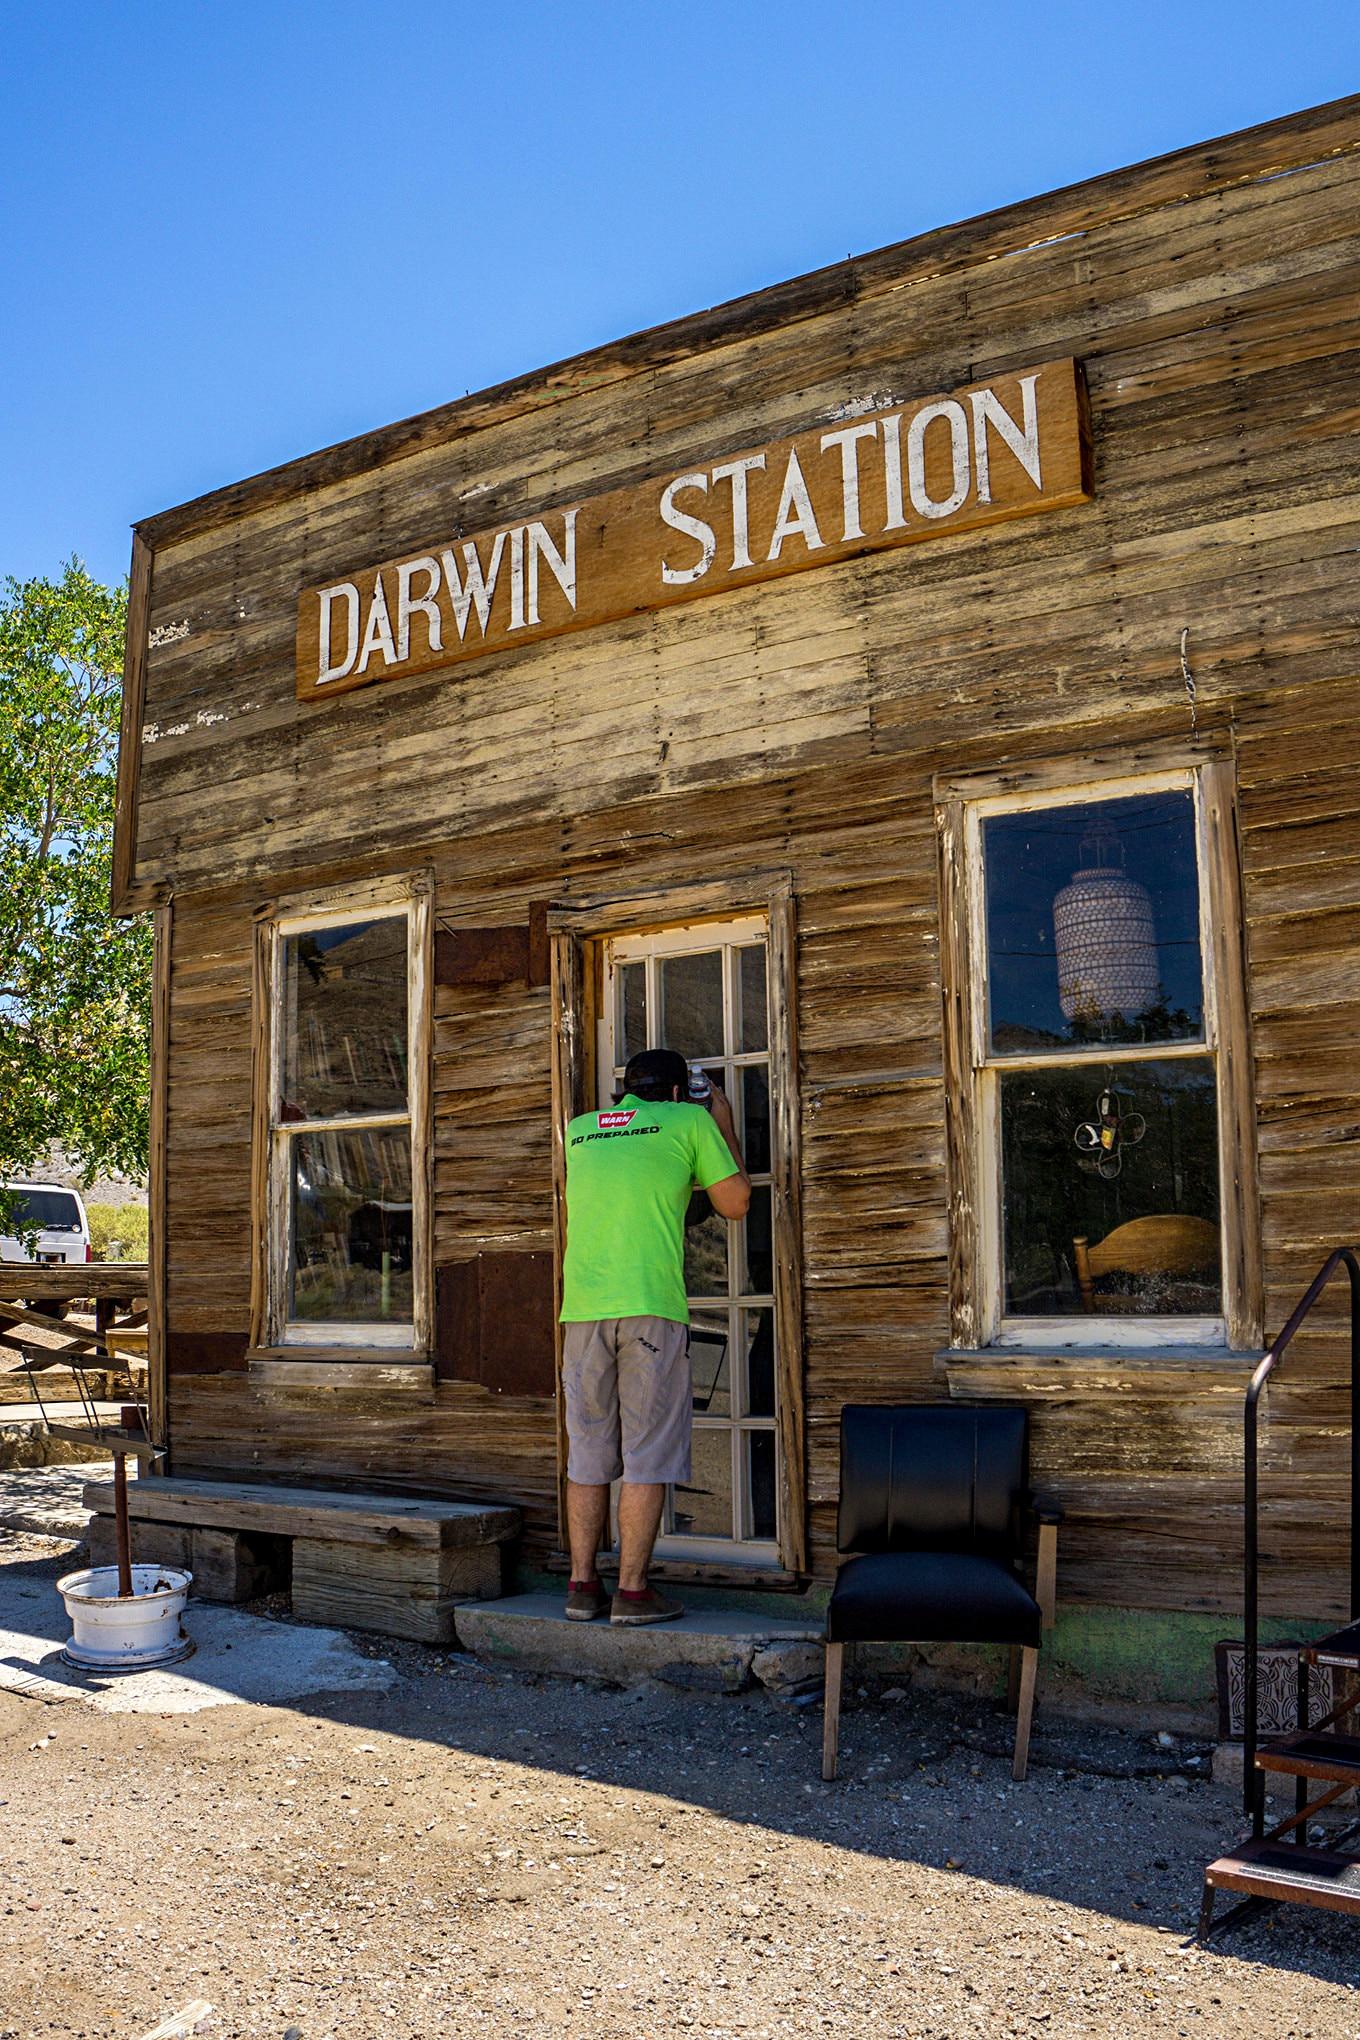 UA day2 darwin station